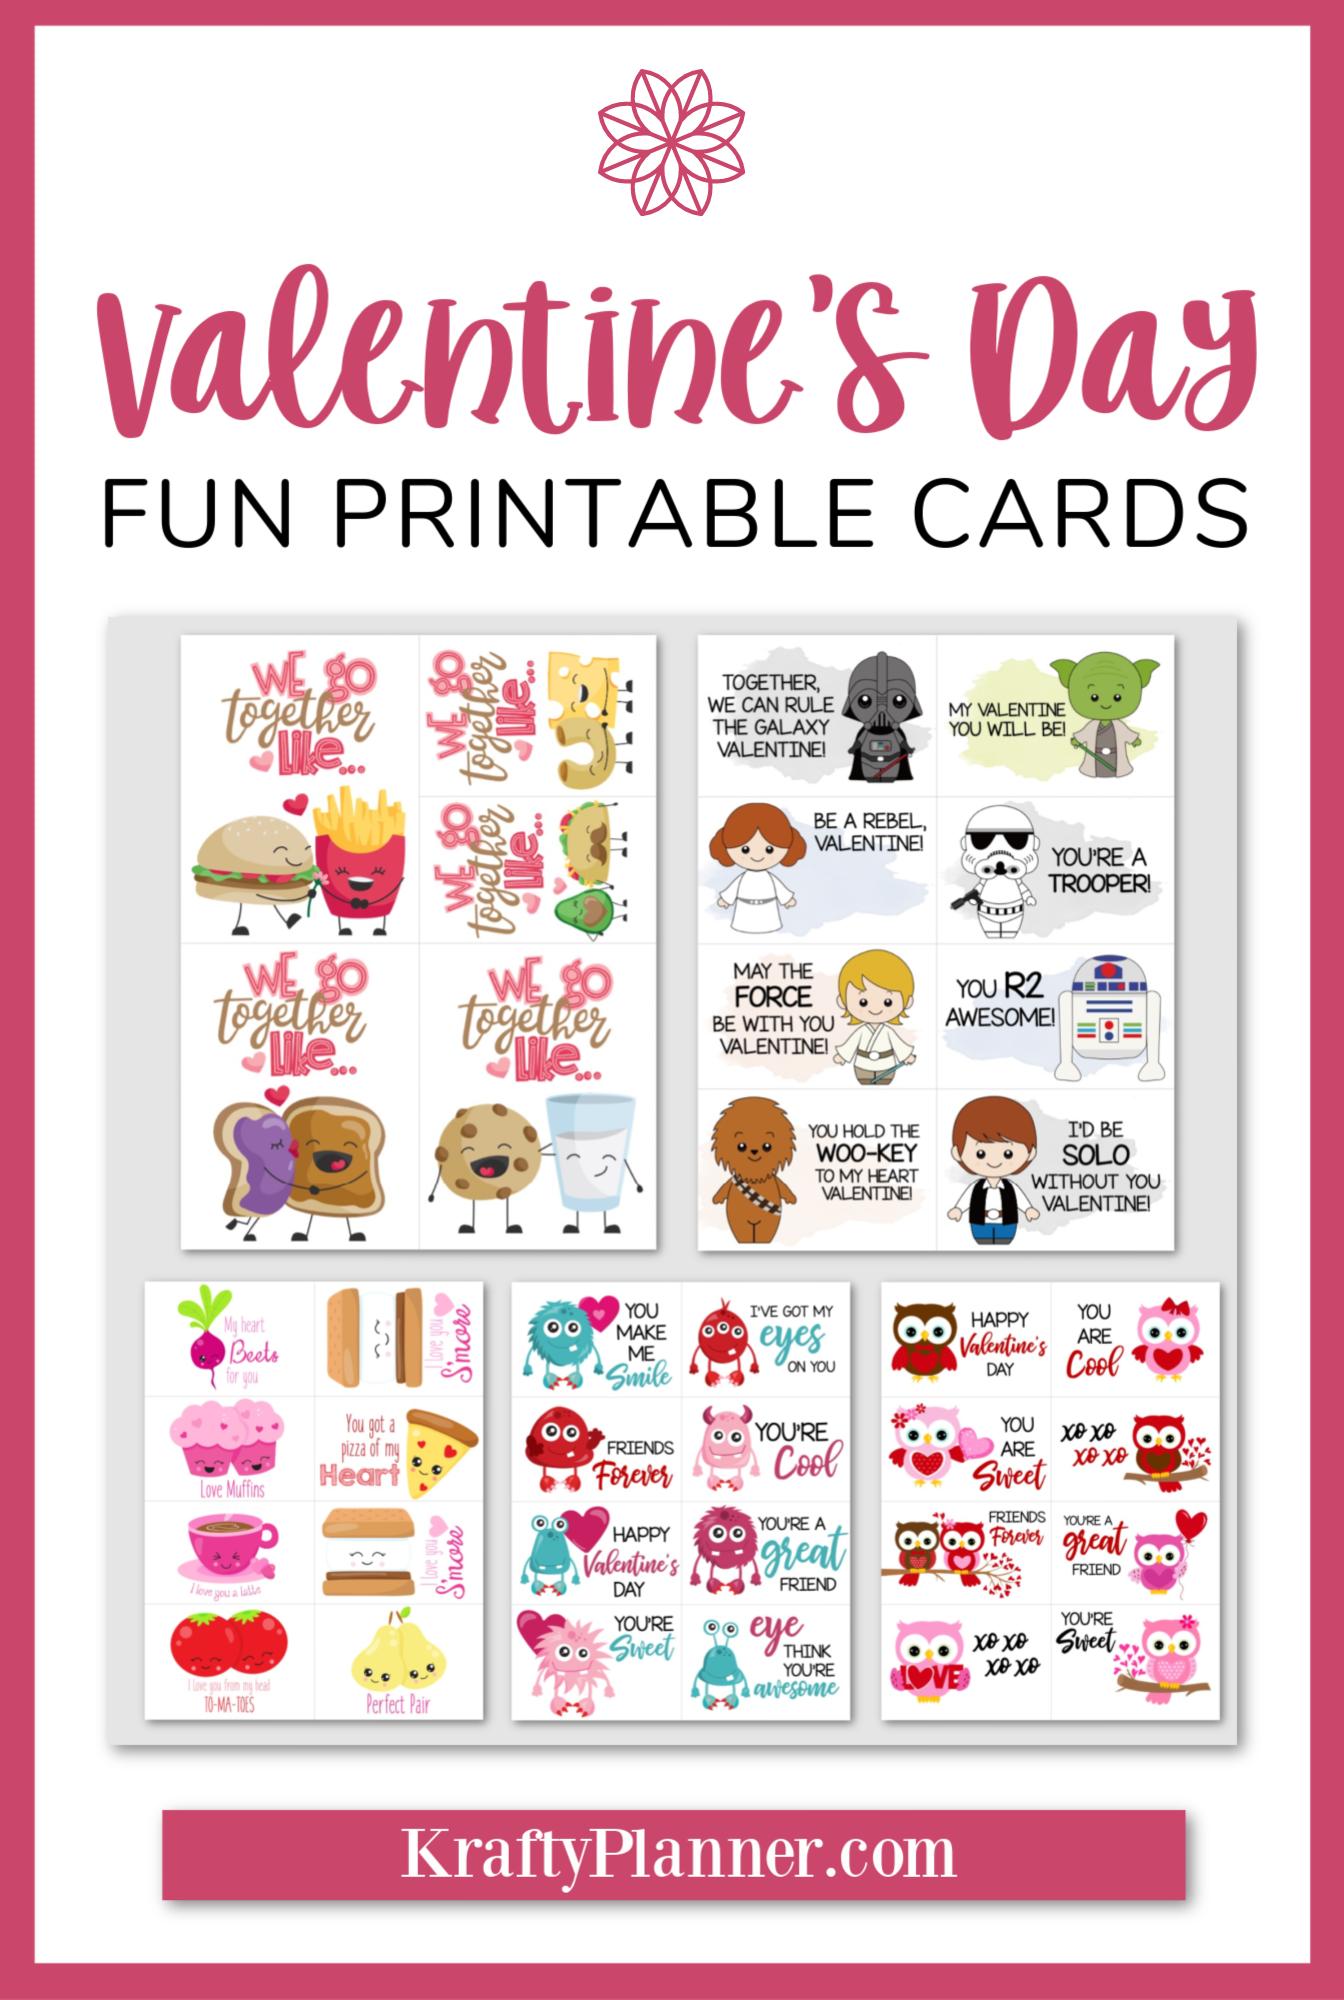 Valentine's Day Fun Printable Cards